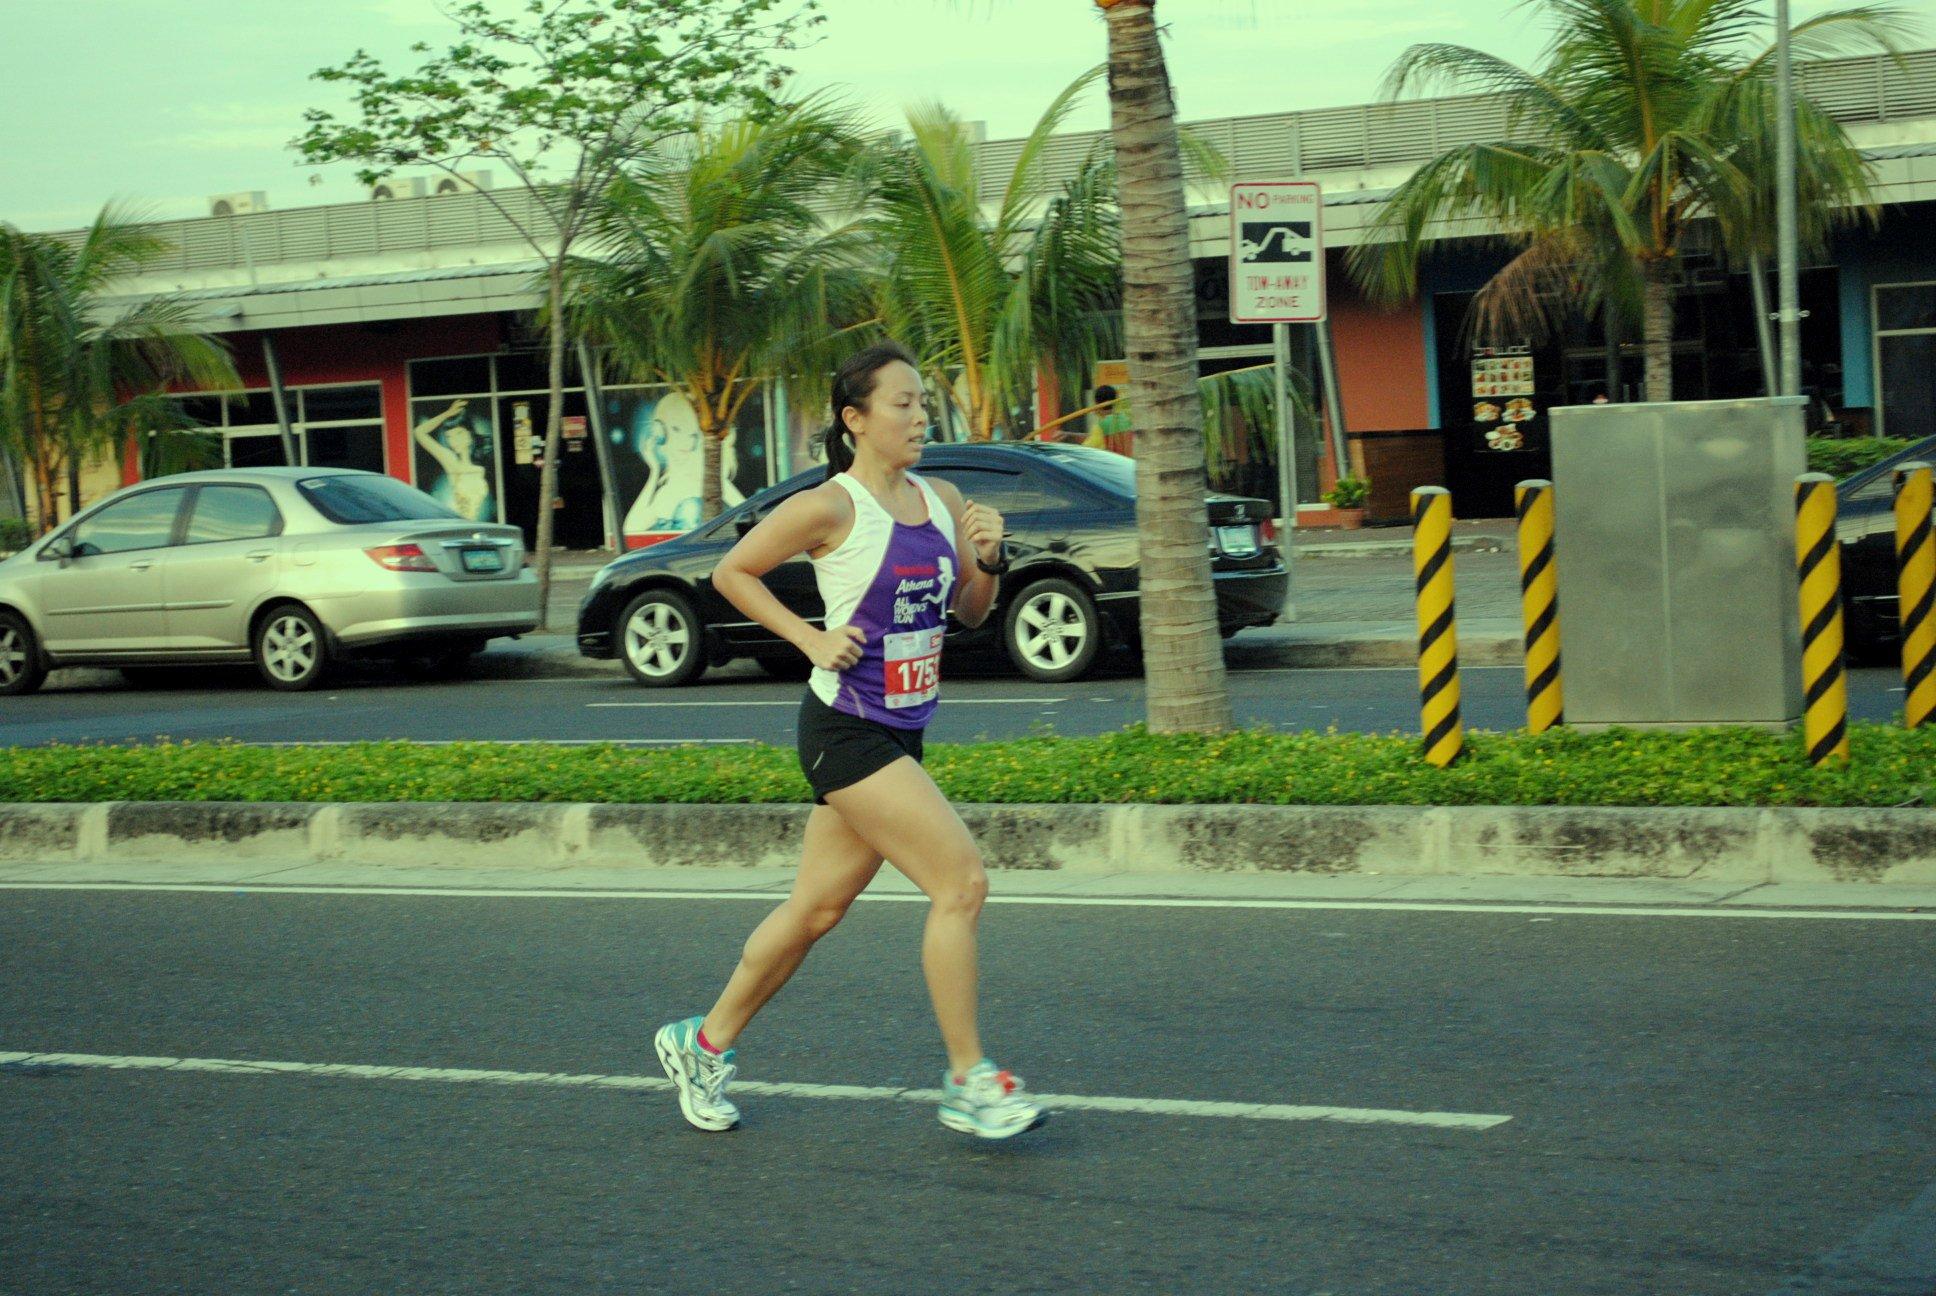 Athena All-Women's Run: To the Finish